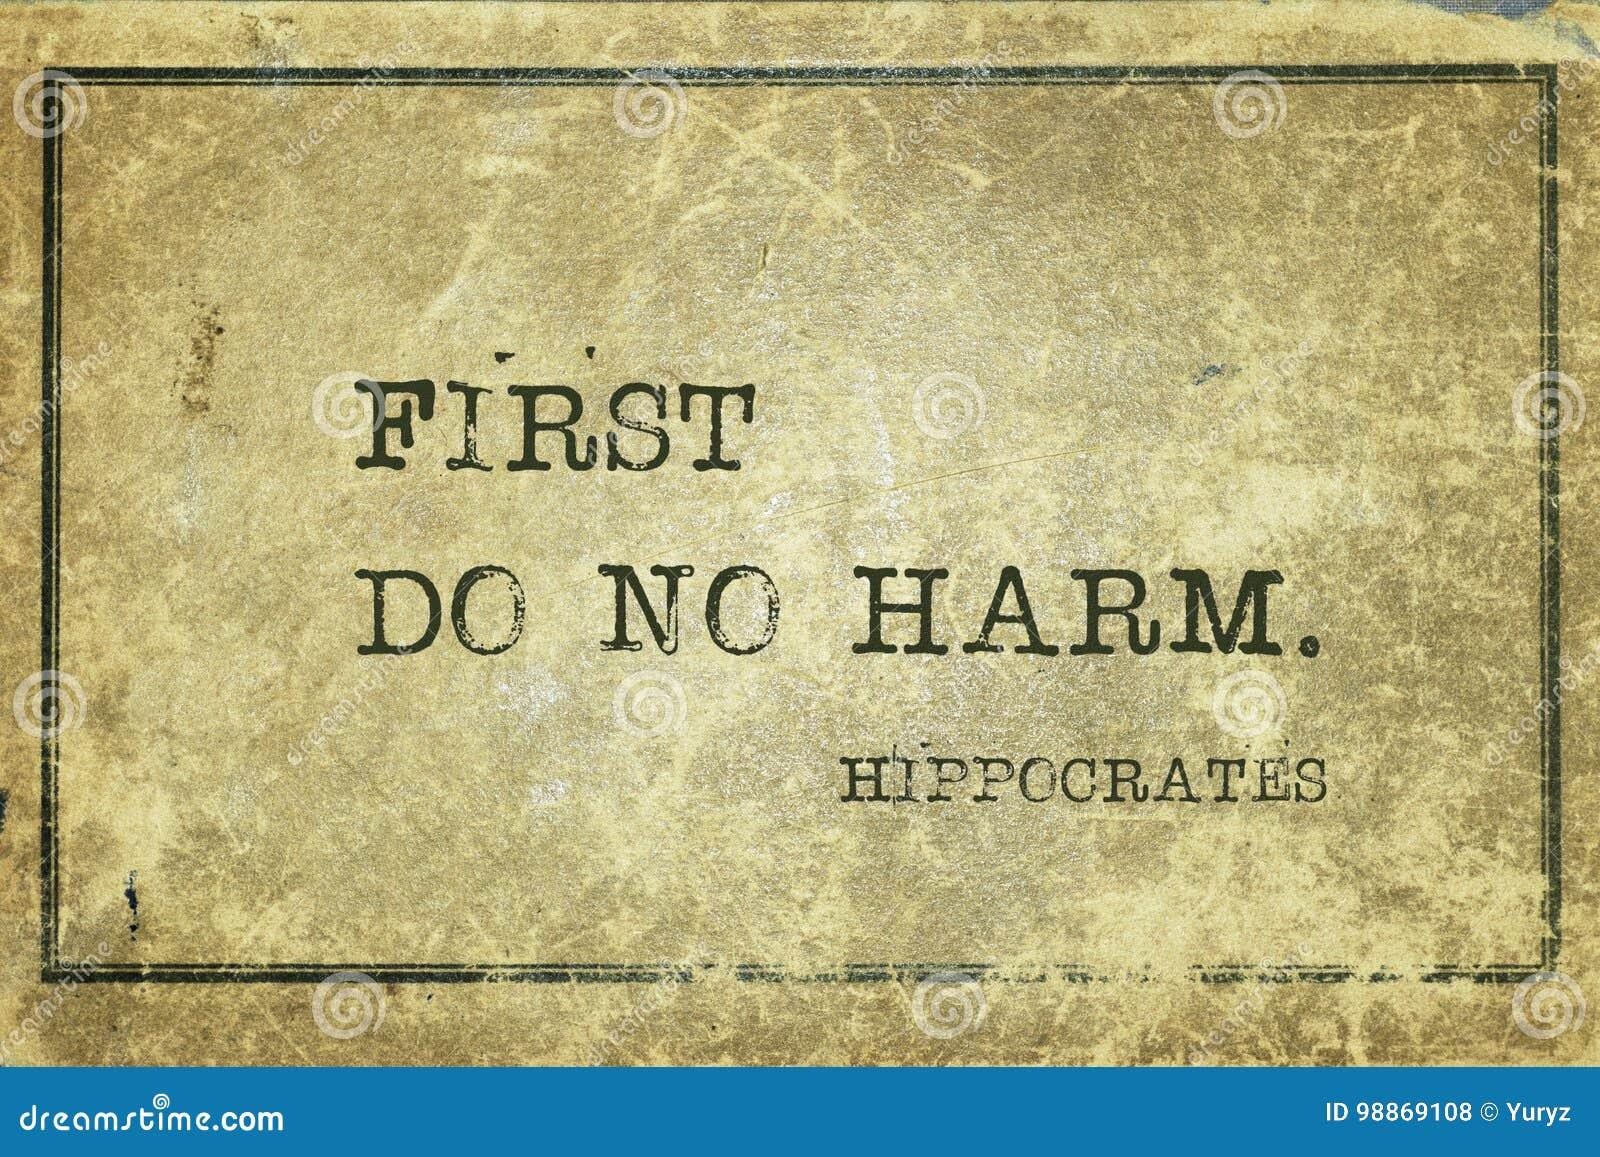 No harm Hippocrates